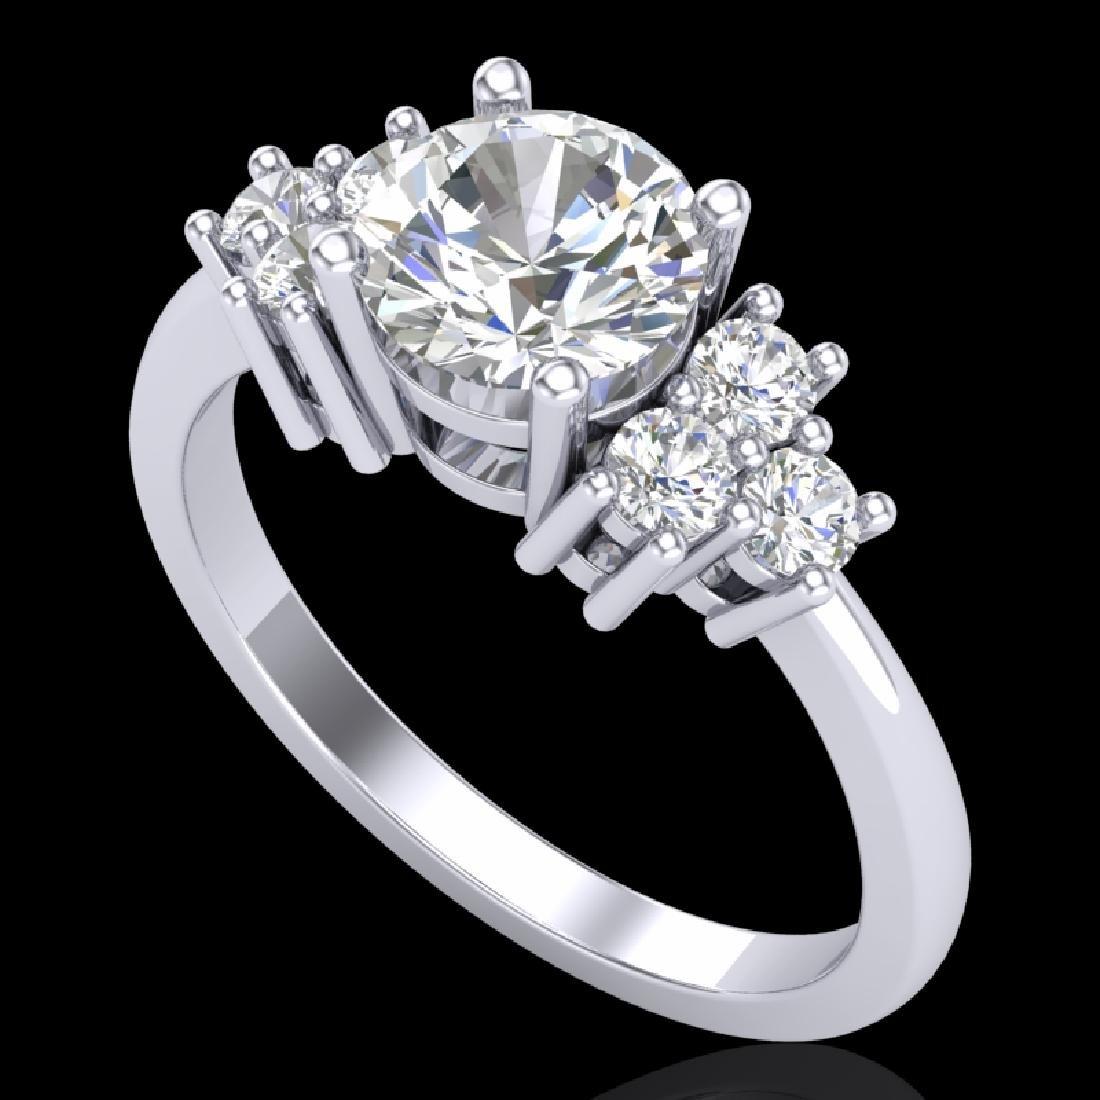 1.5 CTW VS/SI Diamond Solitaire Ring 18K White Gold